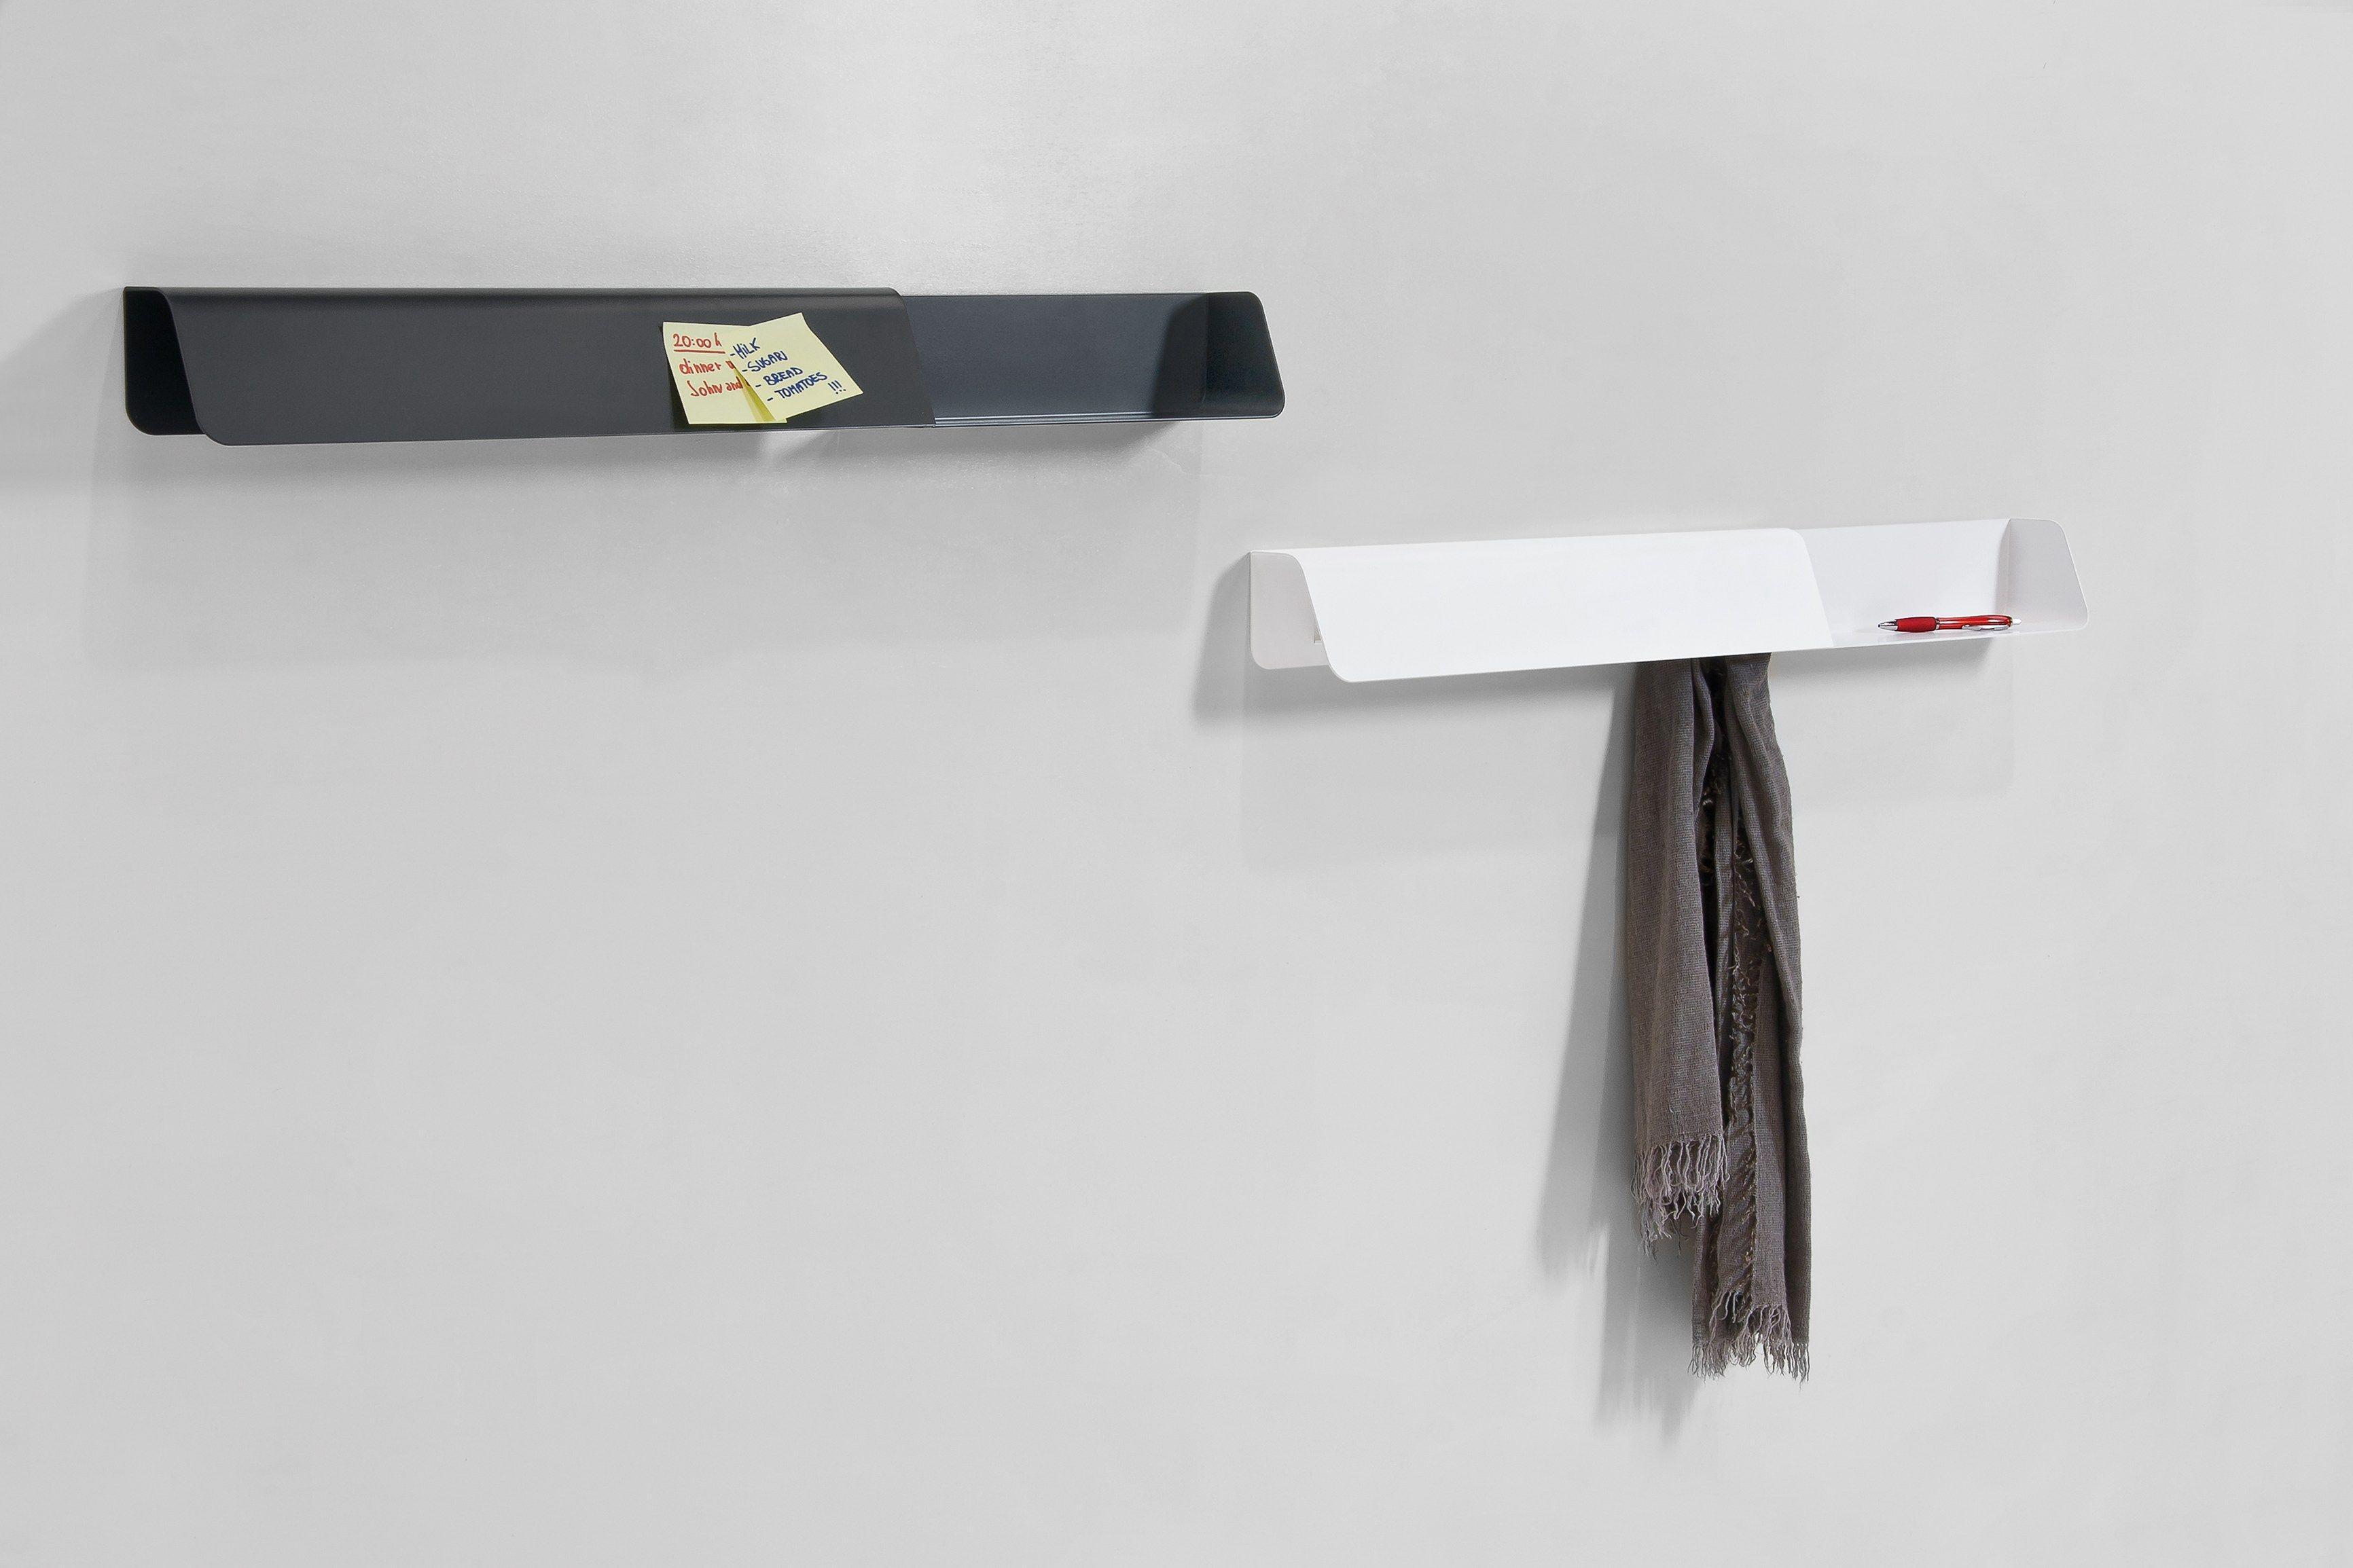 Steel coat rack wall shelf dock by b line design busetti for Garderobe ablage metall